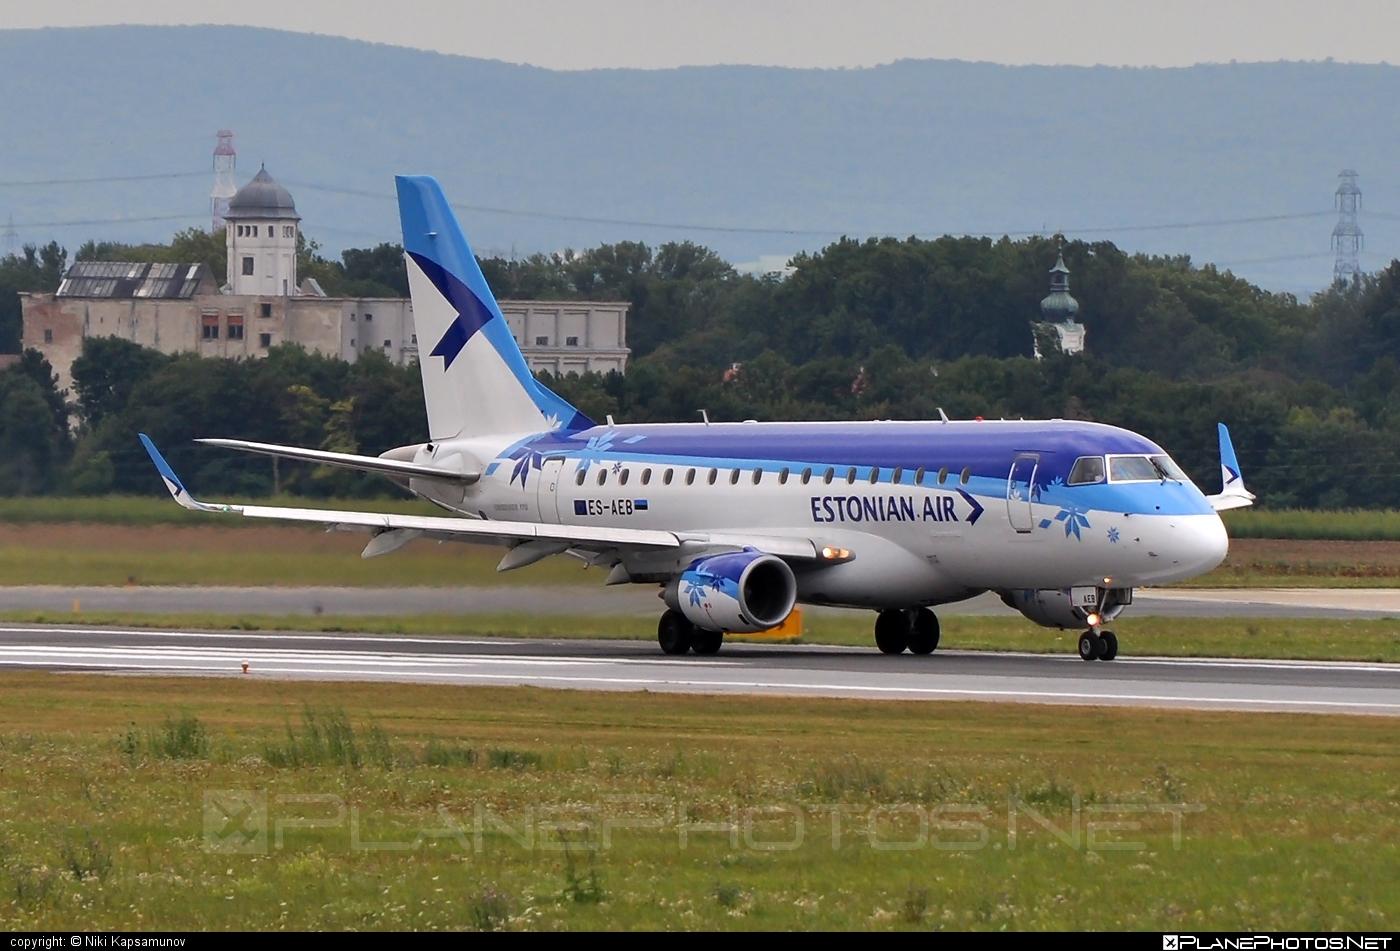 Embraer E170LR (ERJ-170-100LR) - ES-AEB operated by Estonian Air #e170 #embraer #embraer170 #embraer170lr #erj170 #erj170100 #erj170100lr #erj170lr